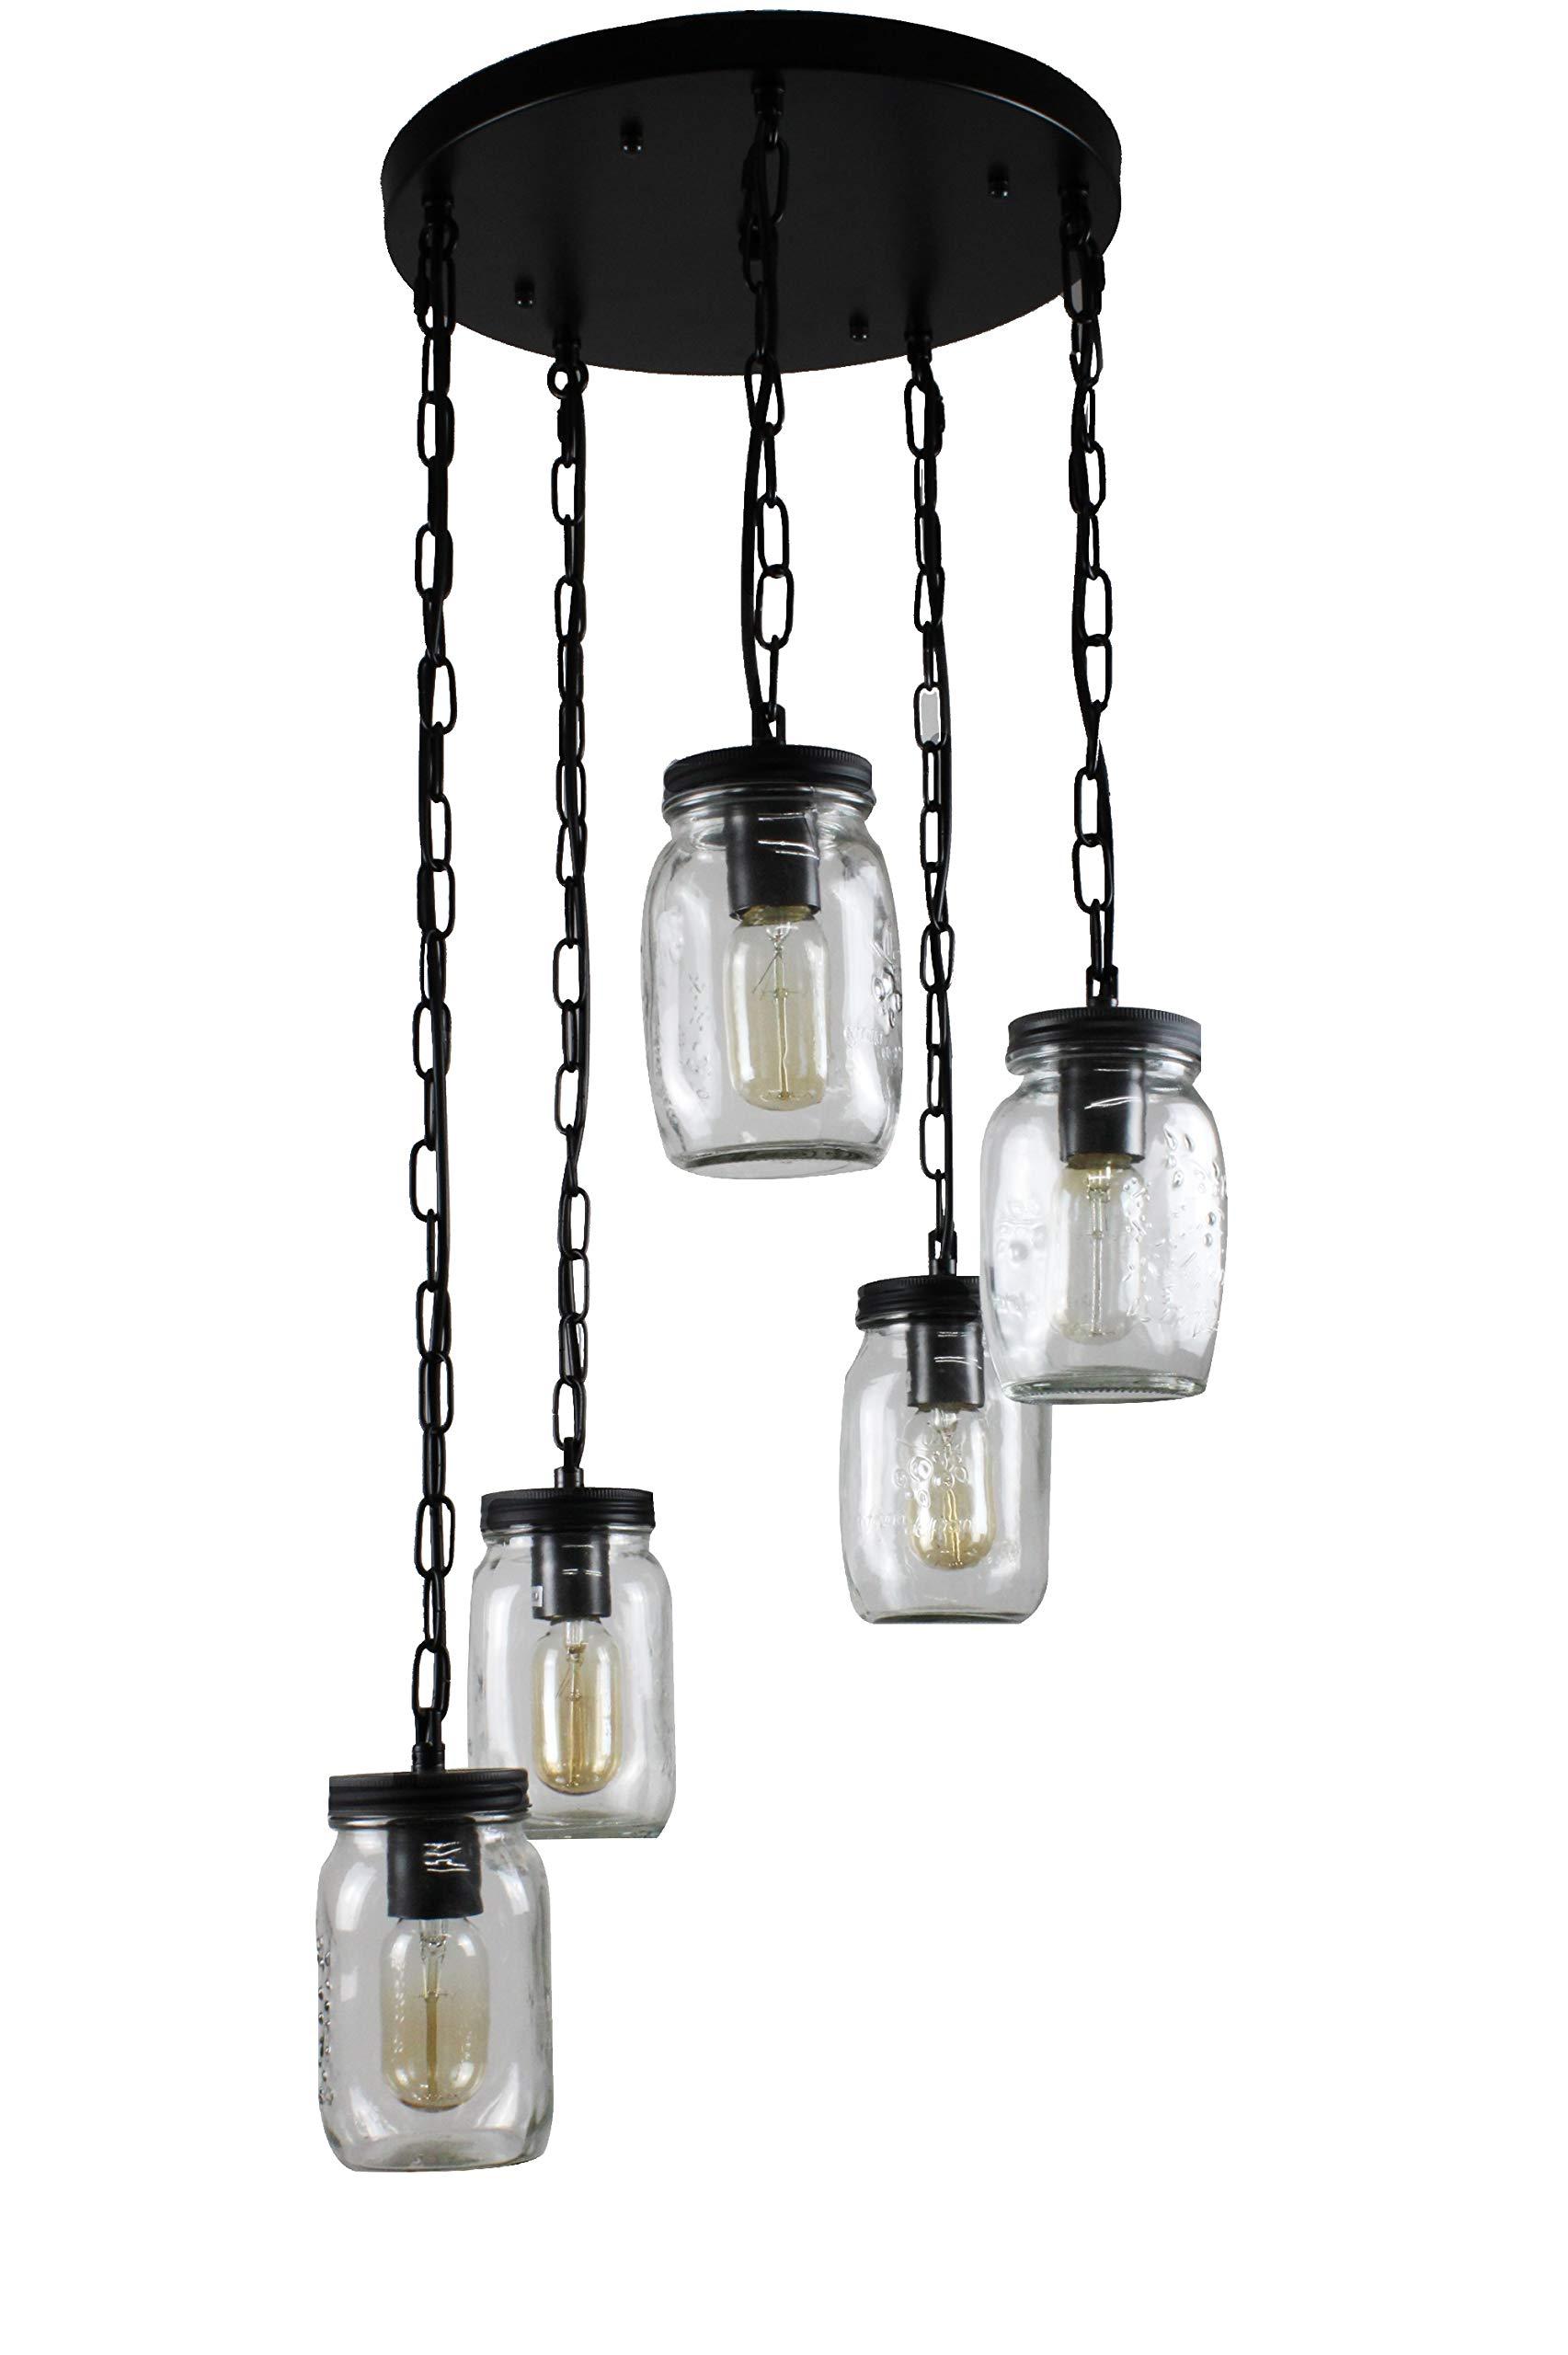 Modern Mason Jar Kitchen Island Lighting 5-Light Glass Chandelier Pendant Lighting Adjustable Hanging Height by BellaDepot